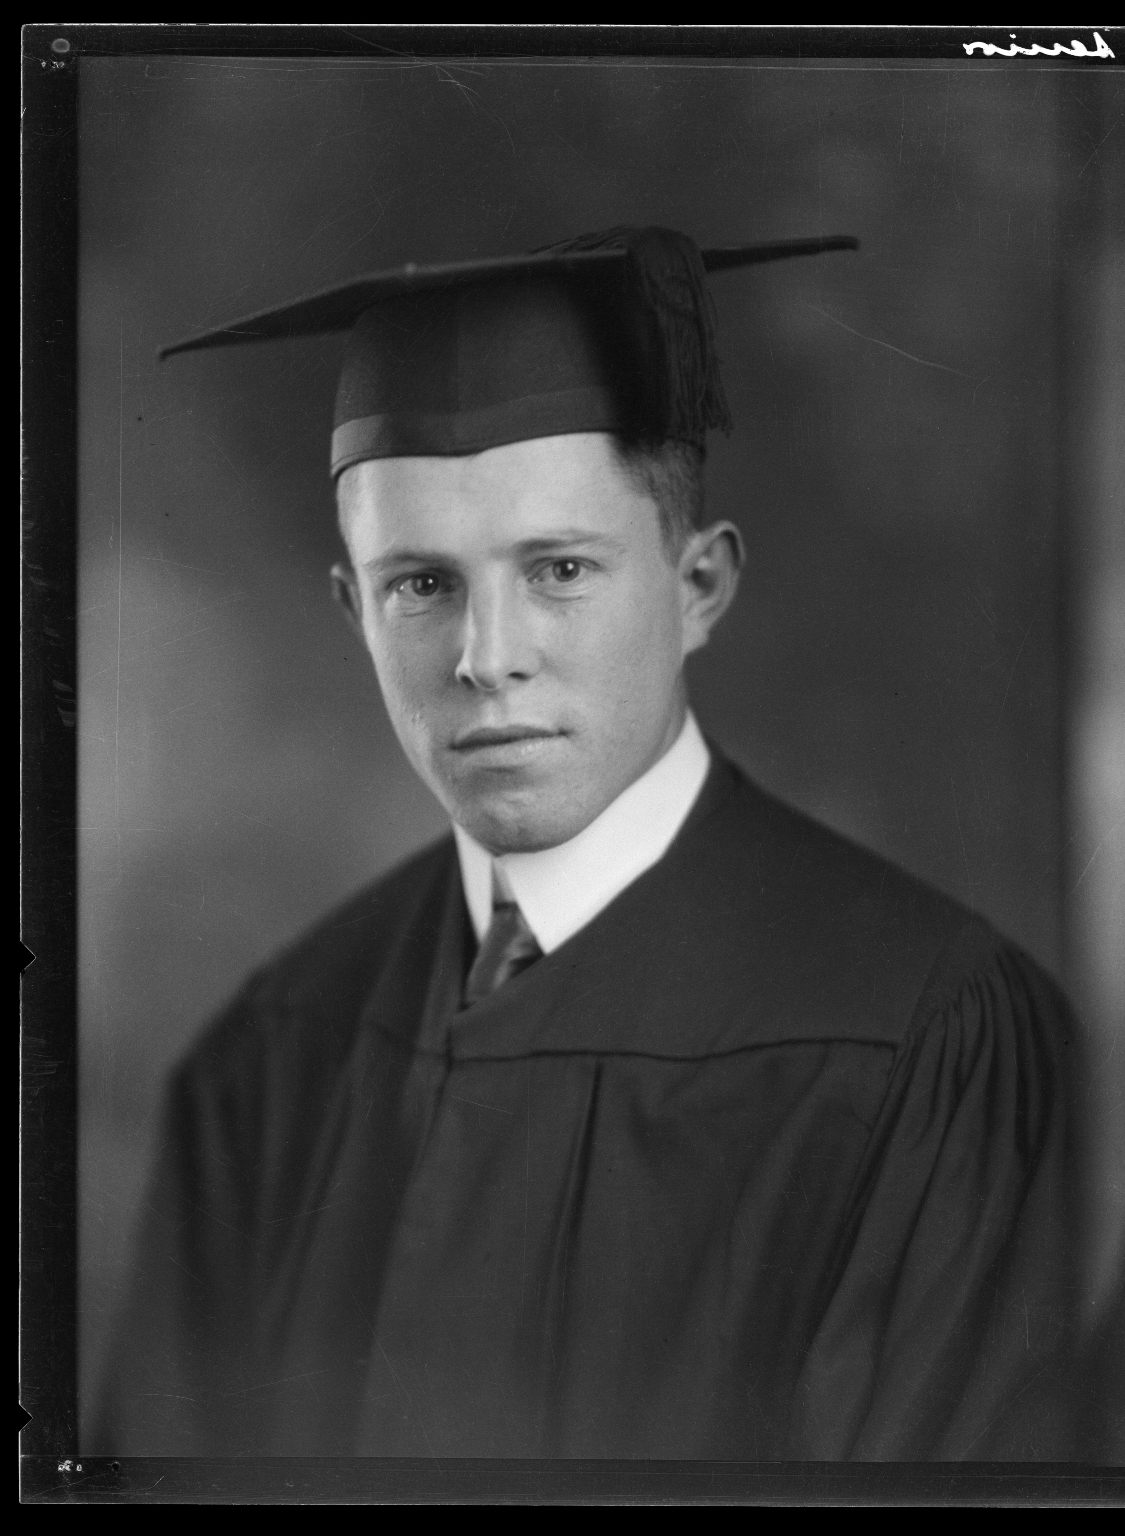 Portraits of F. P. Kerr